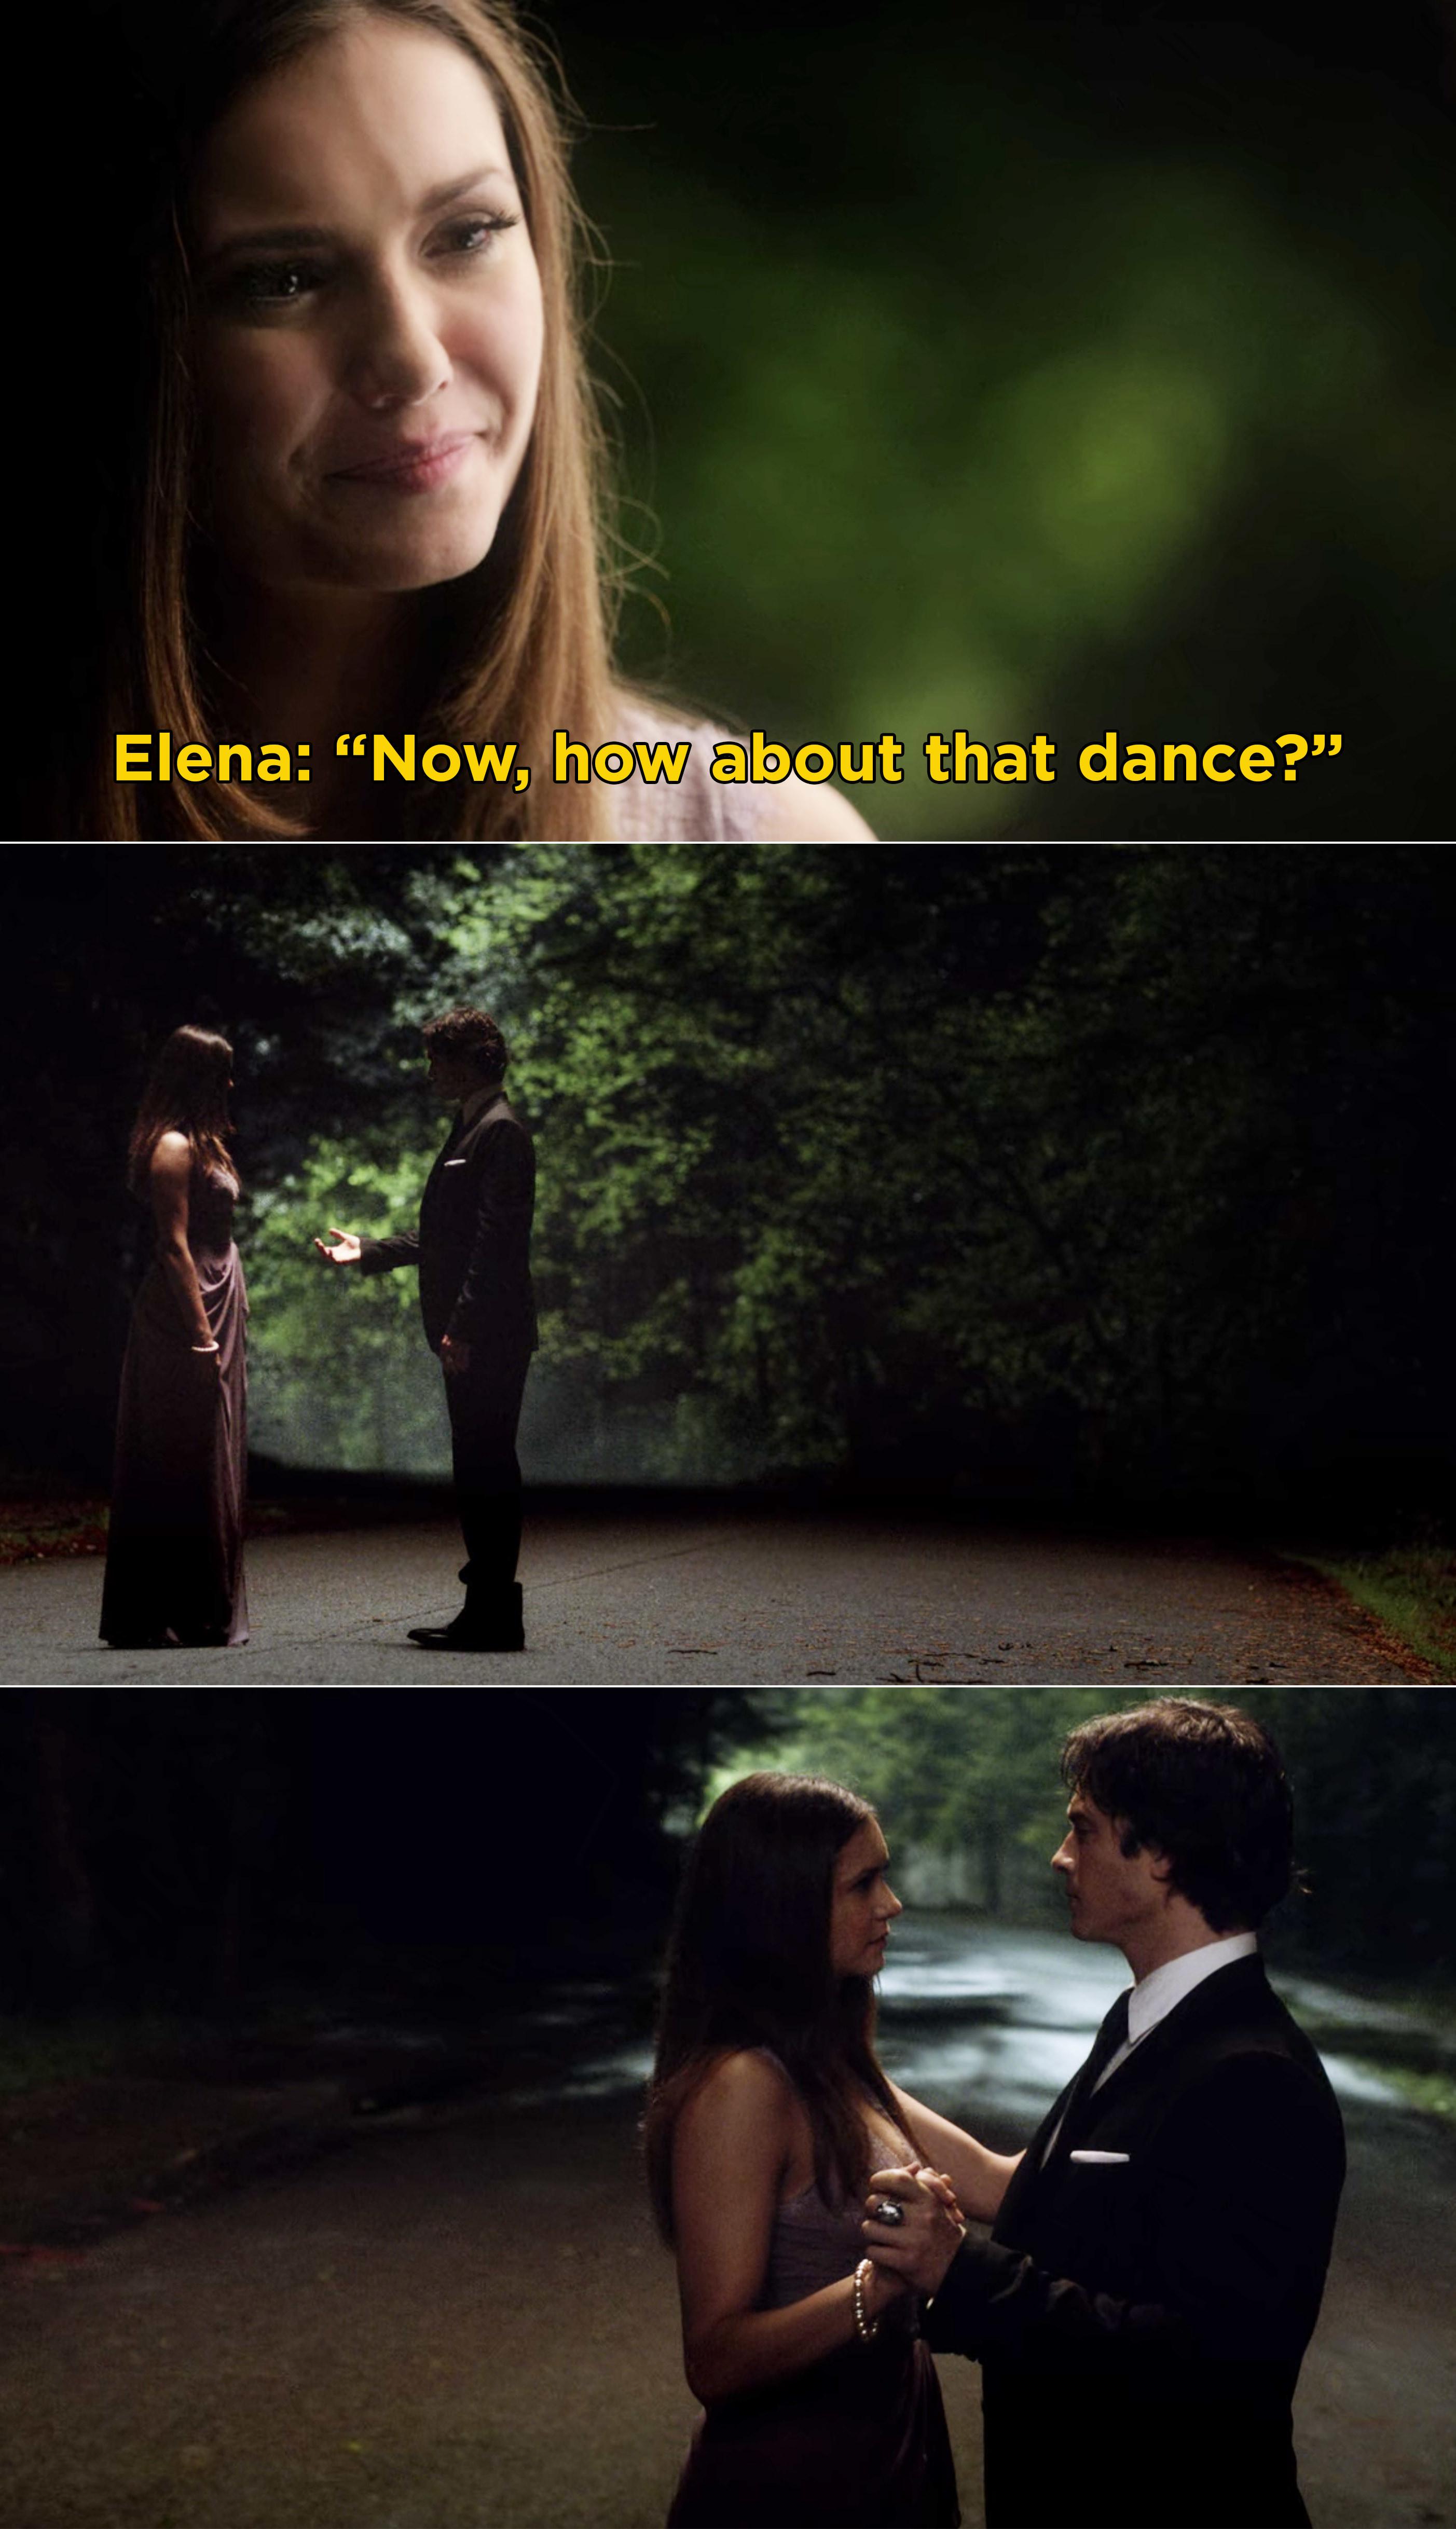 Elena and Damon having their last dance before Elena's coma